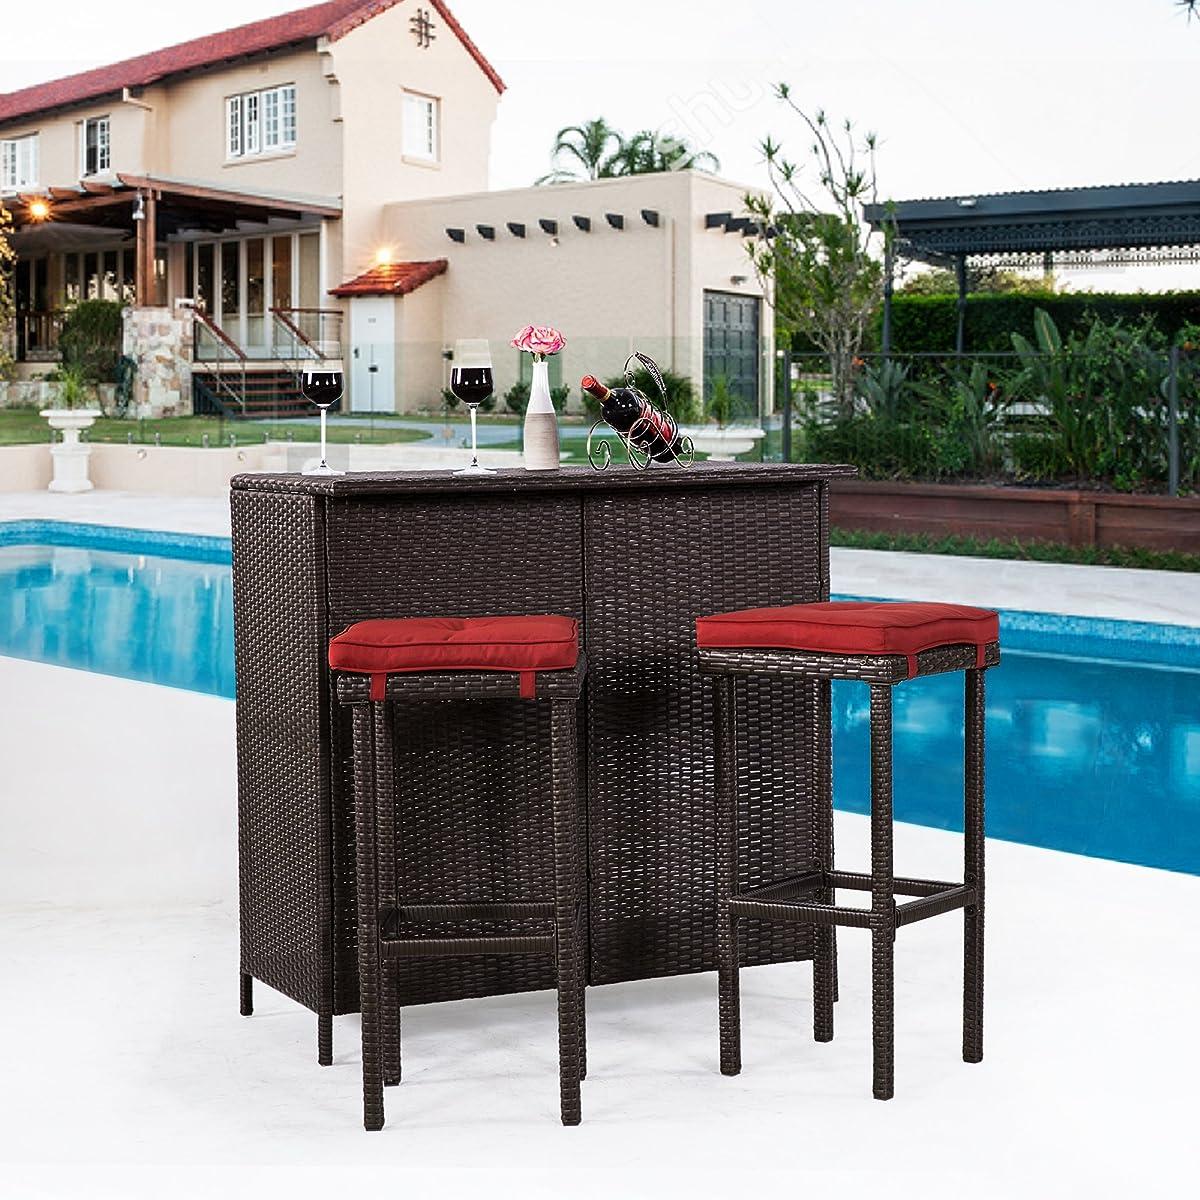 Cloud Mountain 3 PC Wicker Bar Set Patio Outdoor Garden Backyard Rattan Table & 2 Stools Barstool Furniture Set, Brick Red Cushion